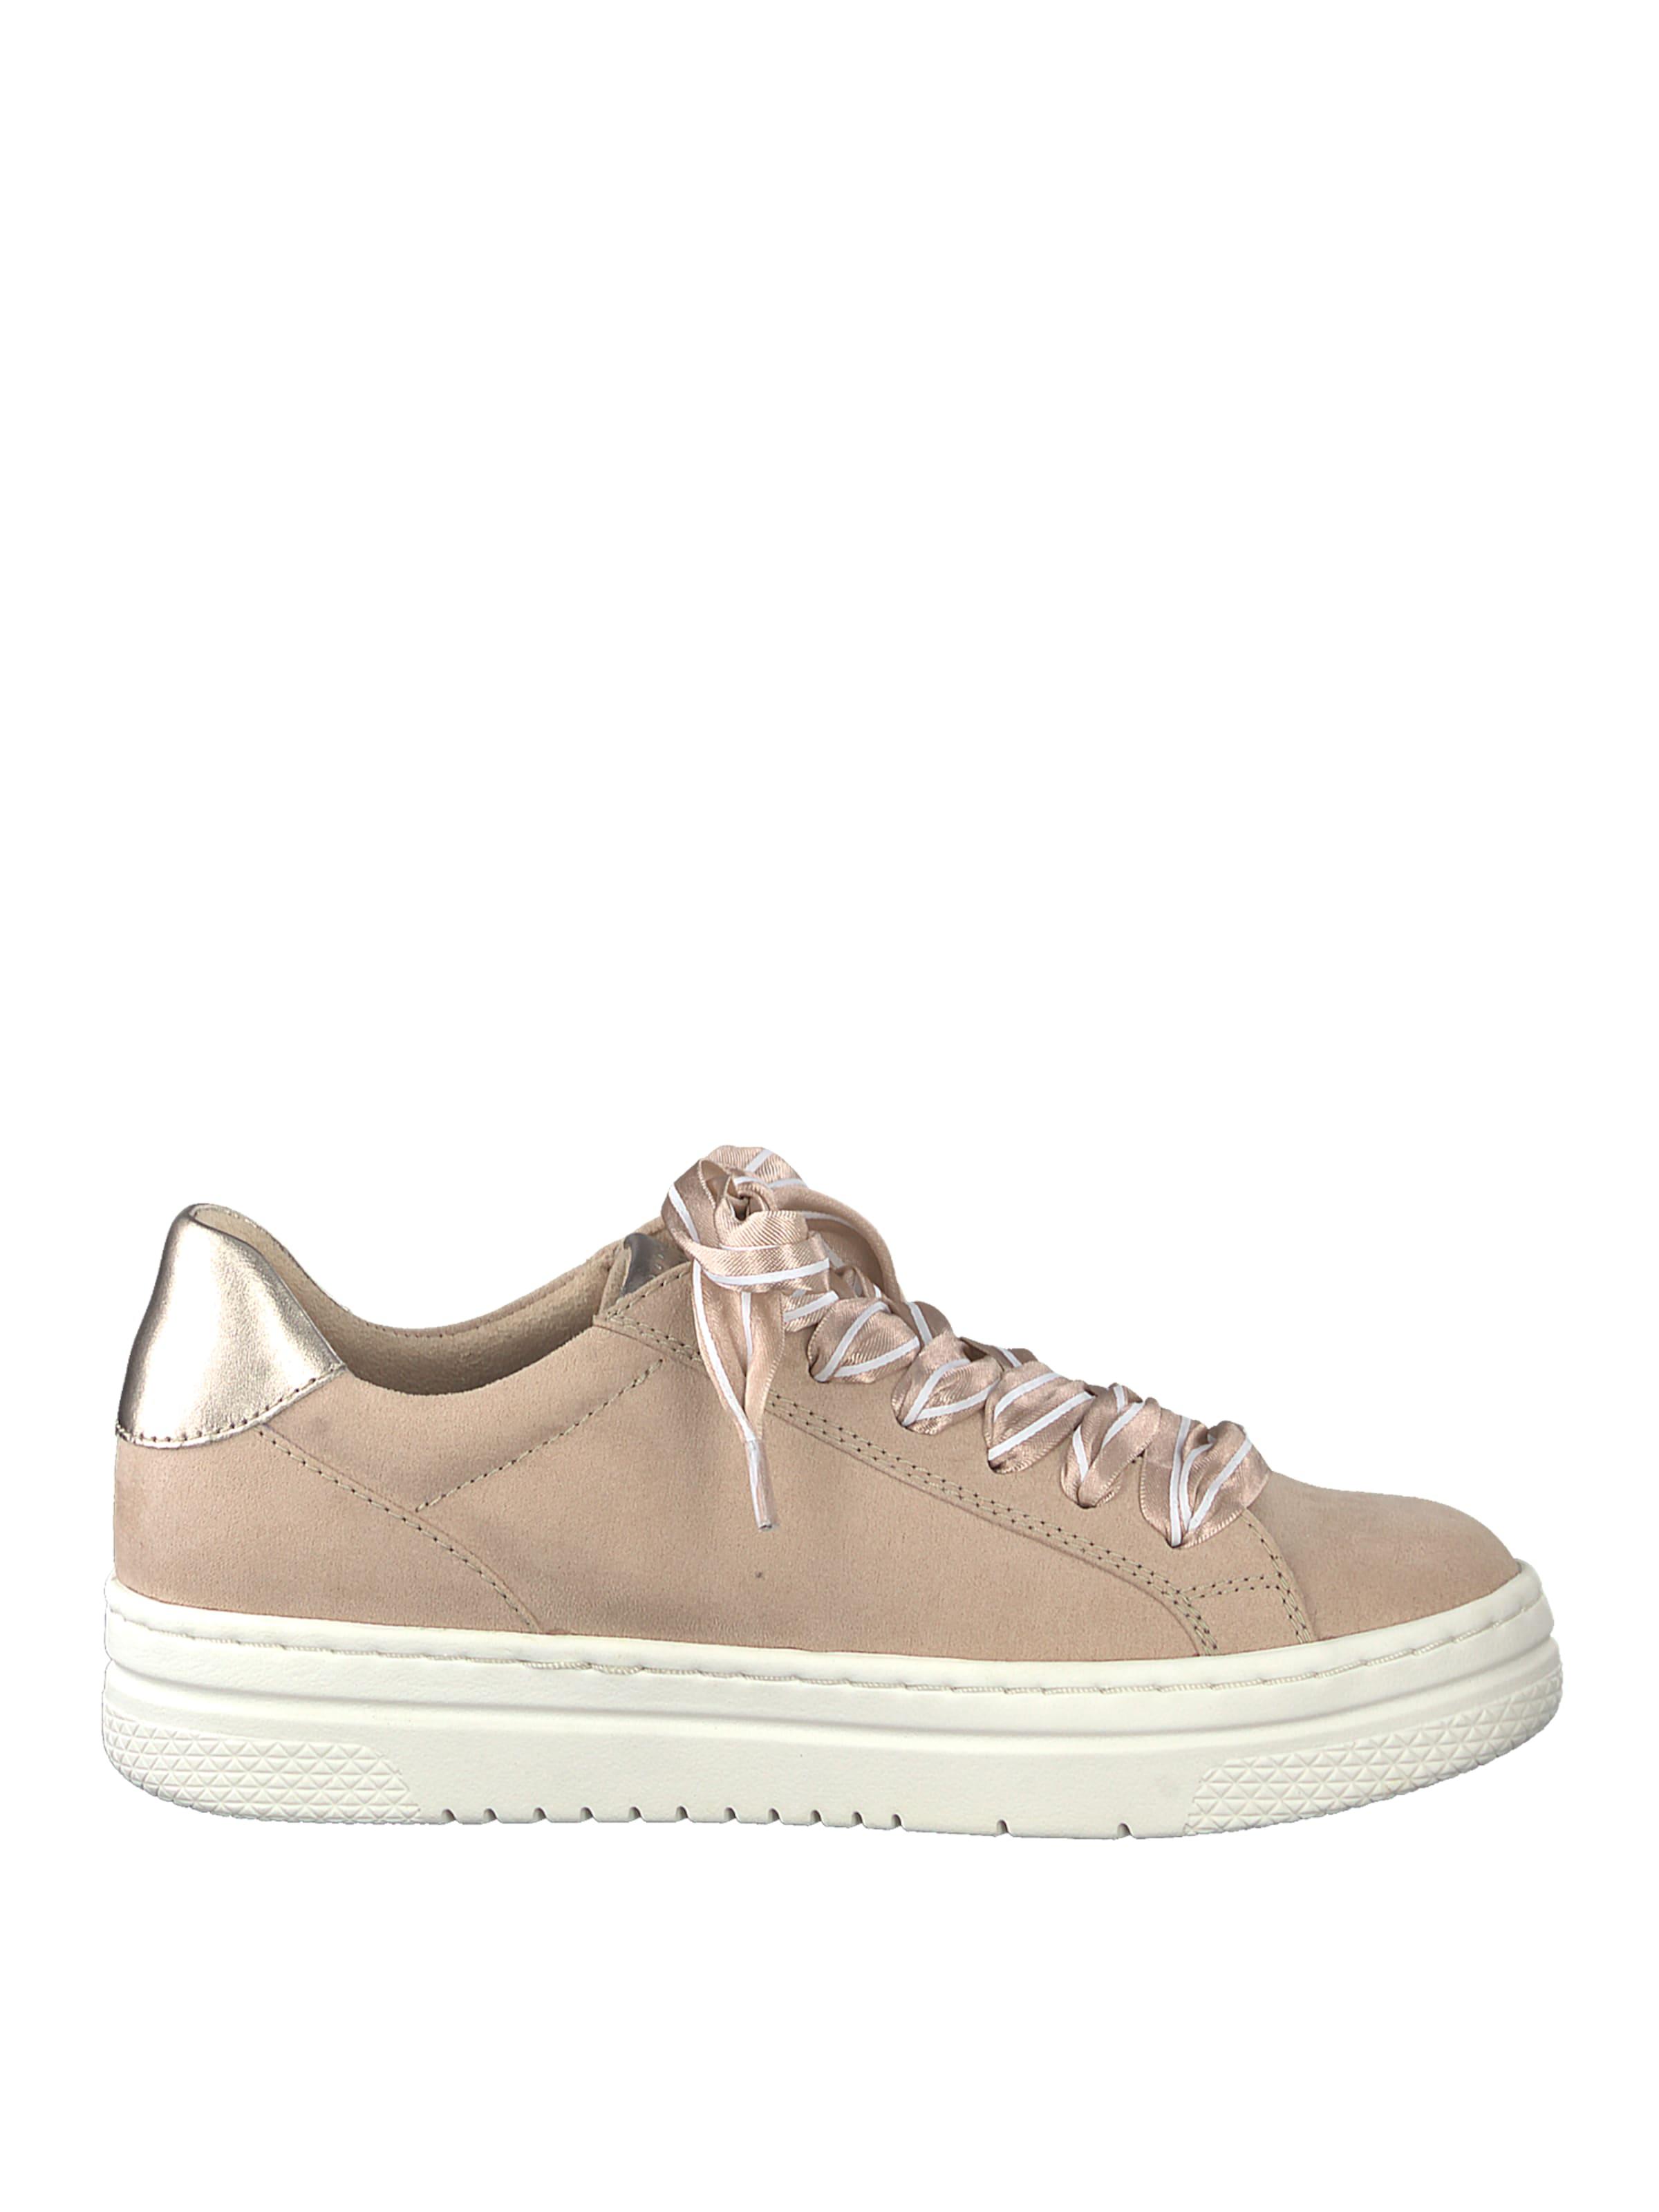 NudeRosa Sneakers Marco Laag In Tozzi FKuTlJ5c31